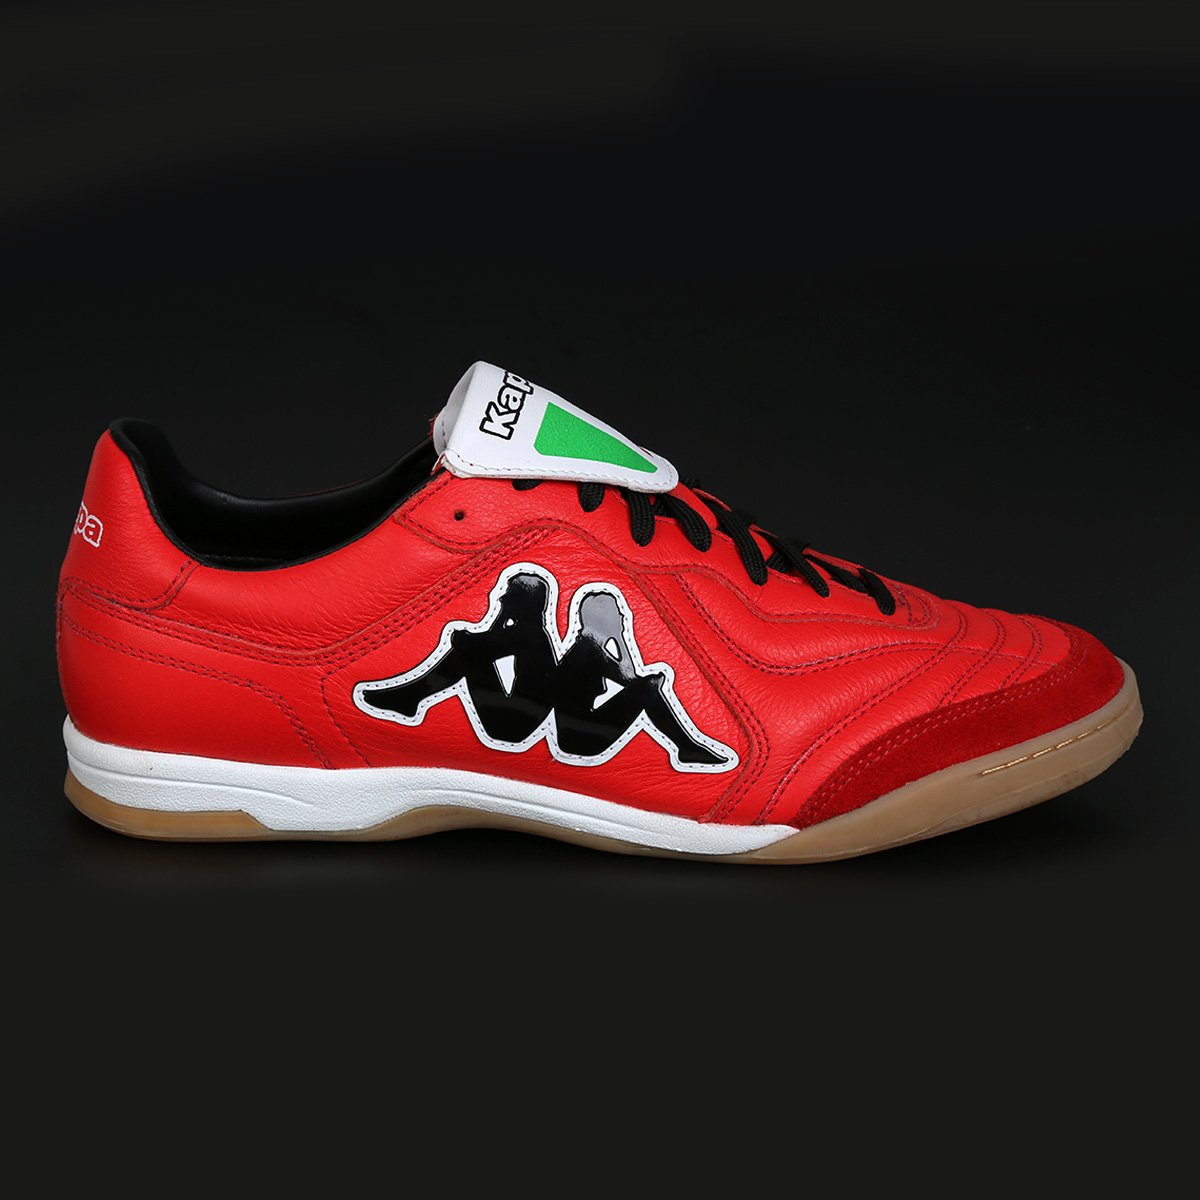 c757981f840a7 Chuteira Futsal Kappa Pelle Couro - Vermelho - Compre Agora